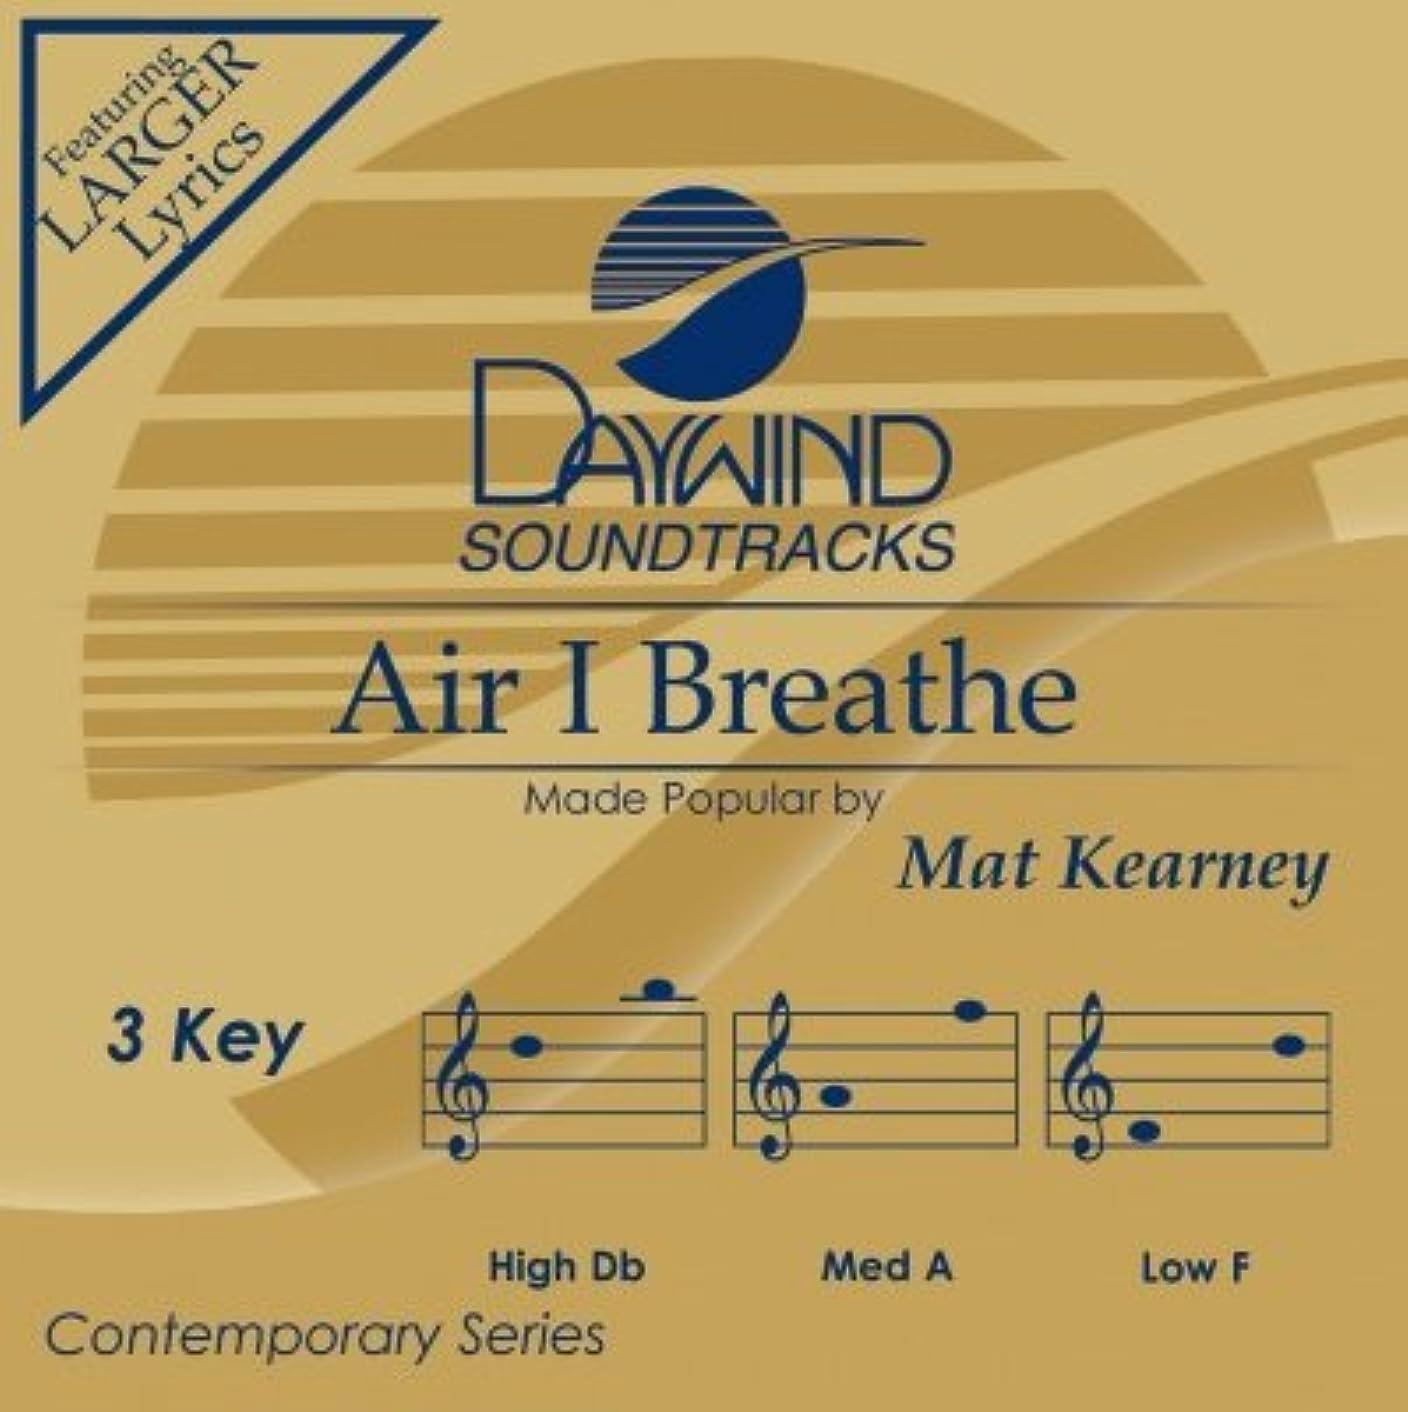 Air I Breathe